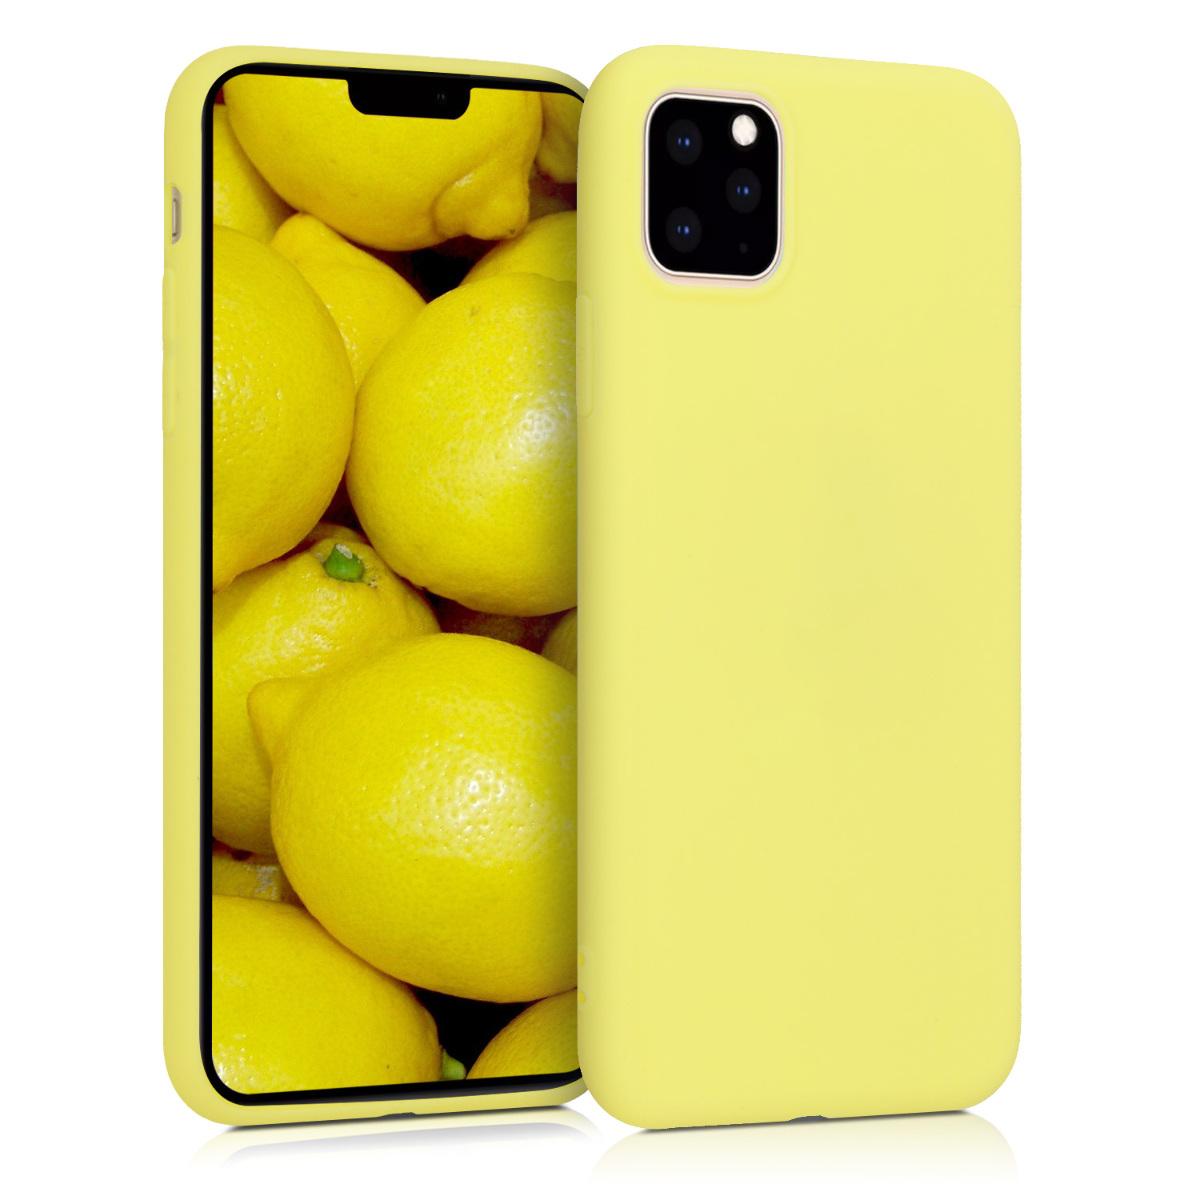 KW Θήκη Σιλικόνης iPhone 11 Pro Max - Pastel Yellow Matte (49789.119)